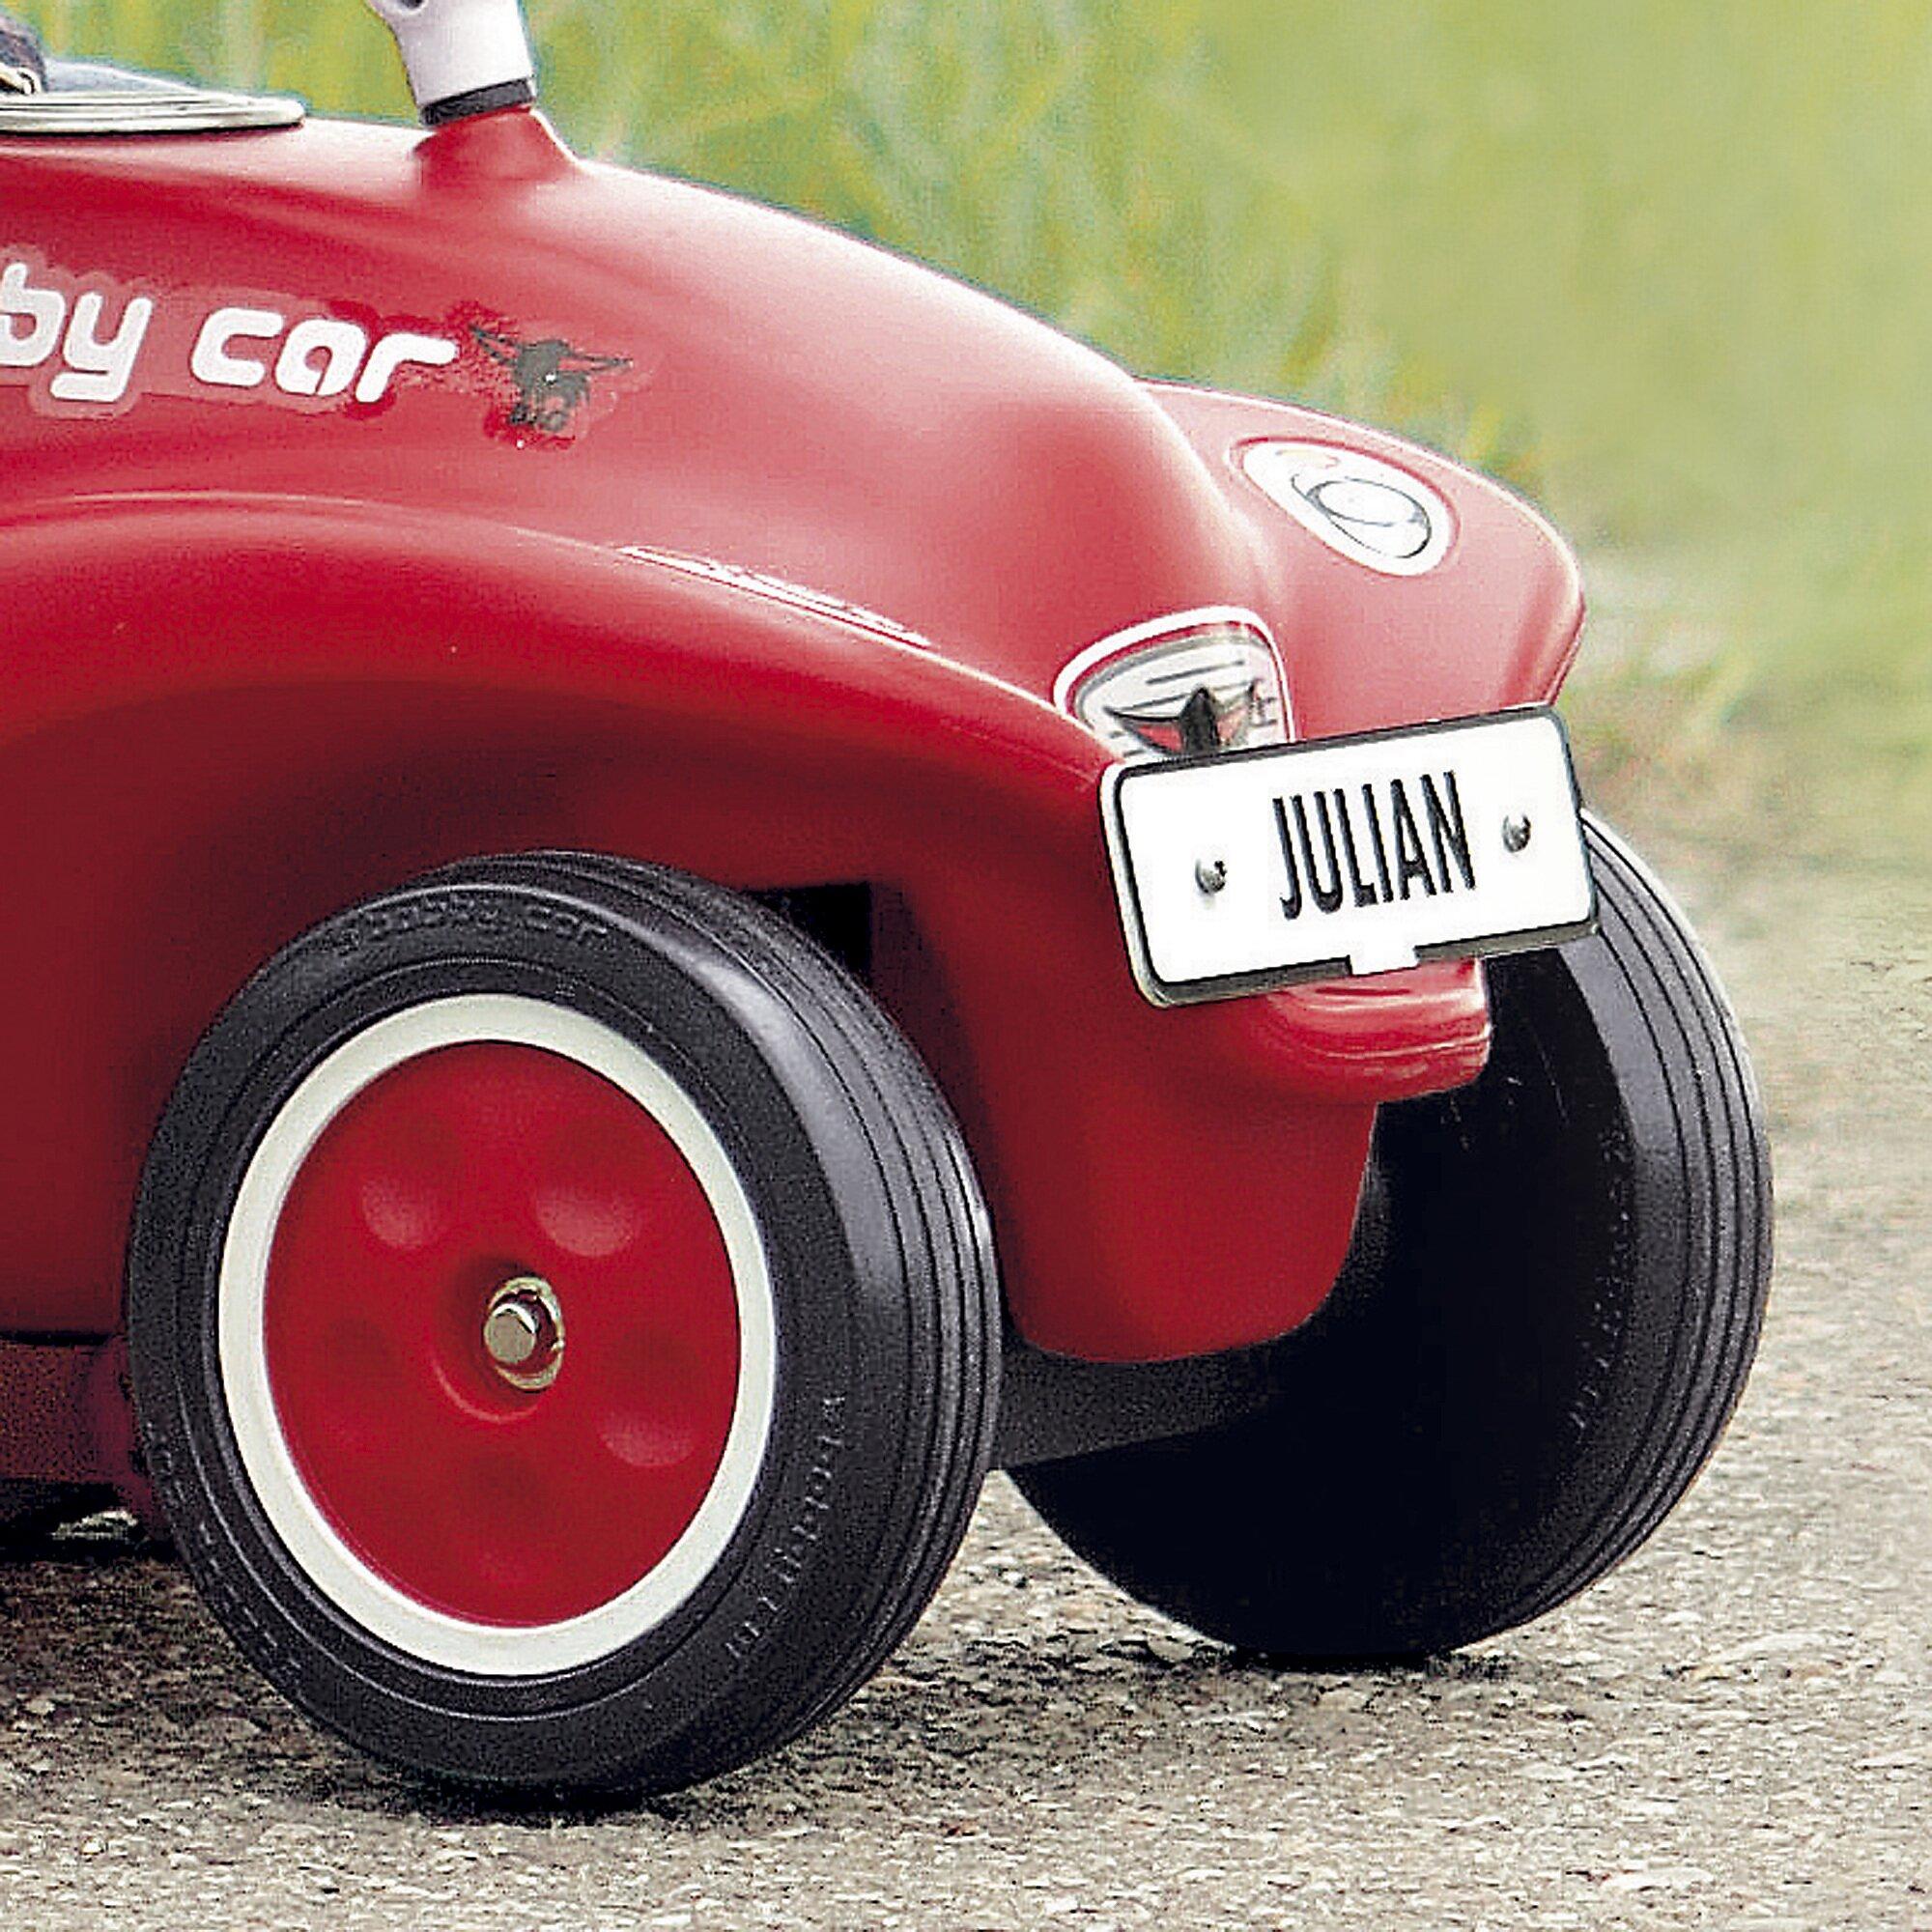 eduplay-bobby-car-nummernschild-weiss